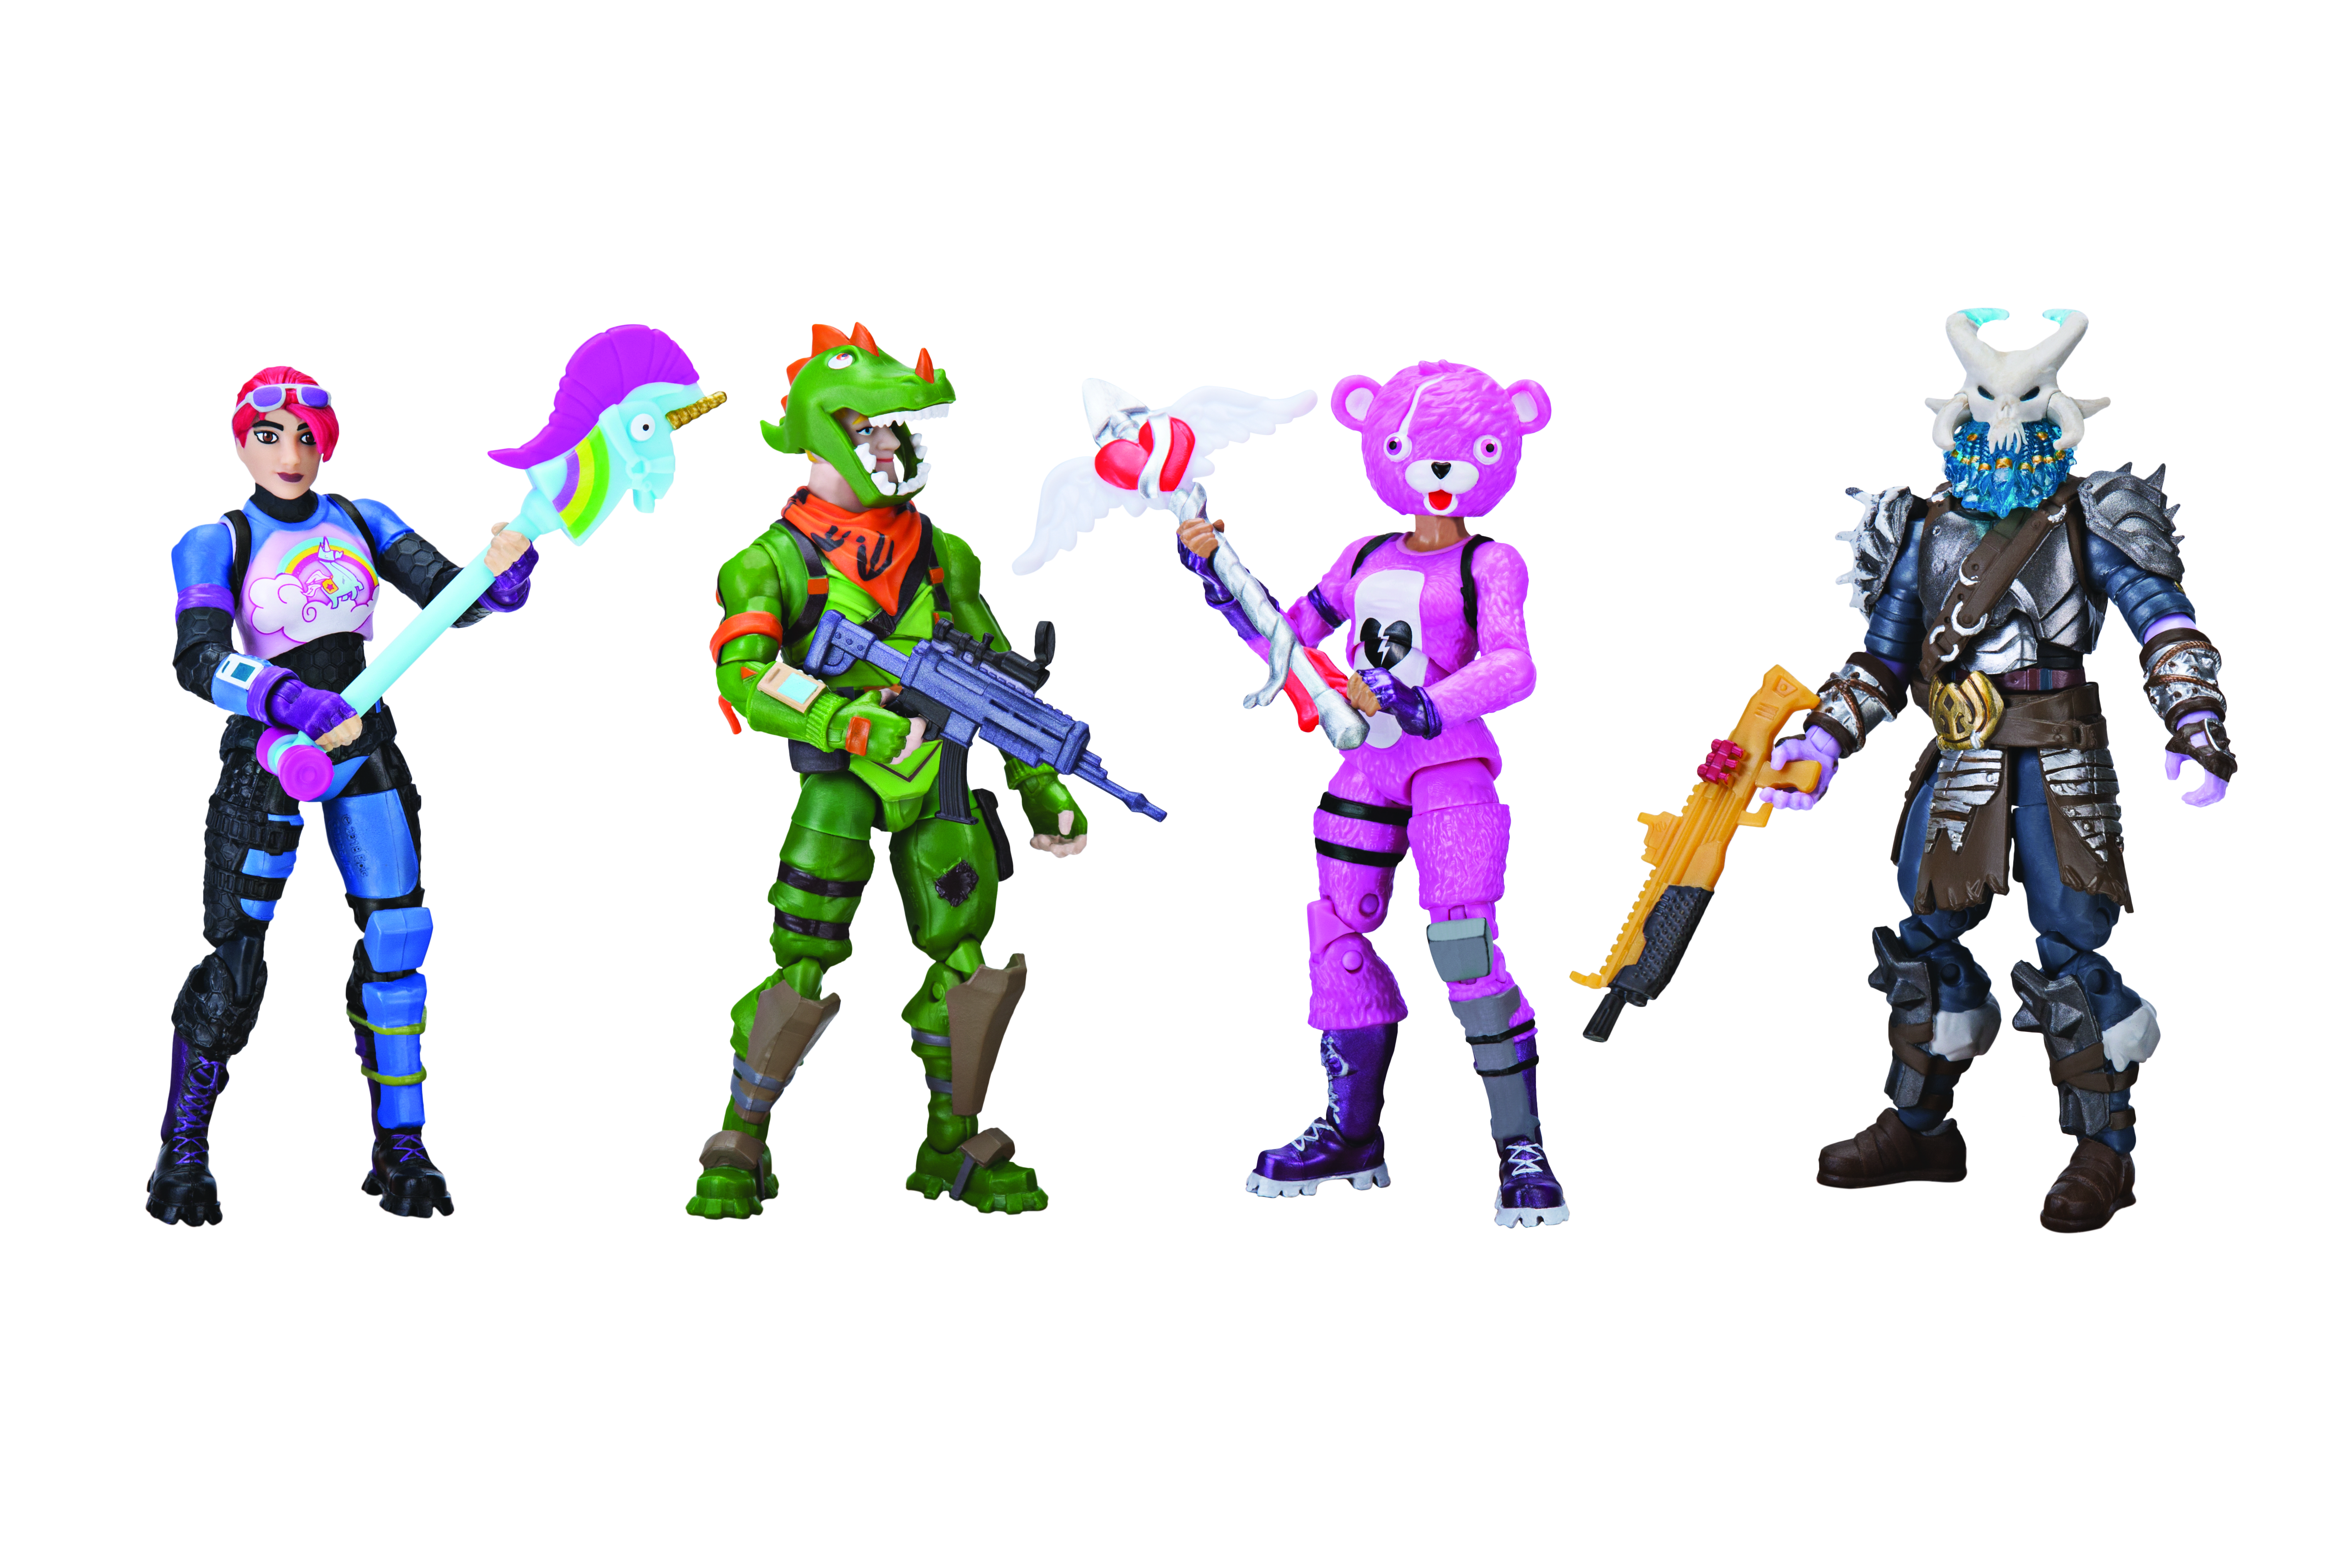 Игровой набор Jaswares Rex, Cuddle Team Leader, Brite Bomber, Ragnarok